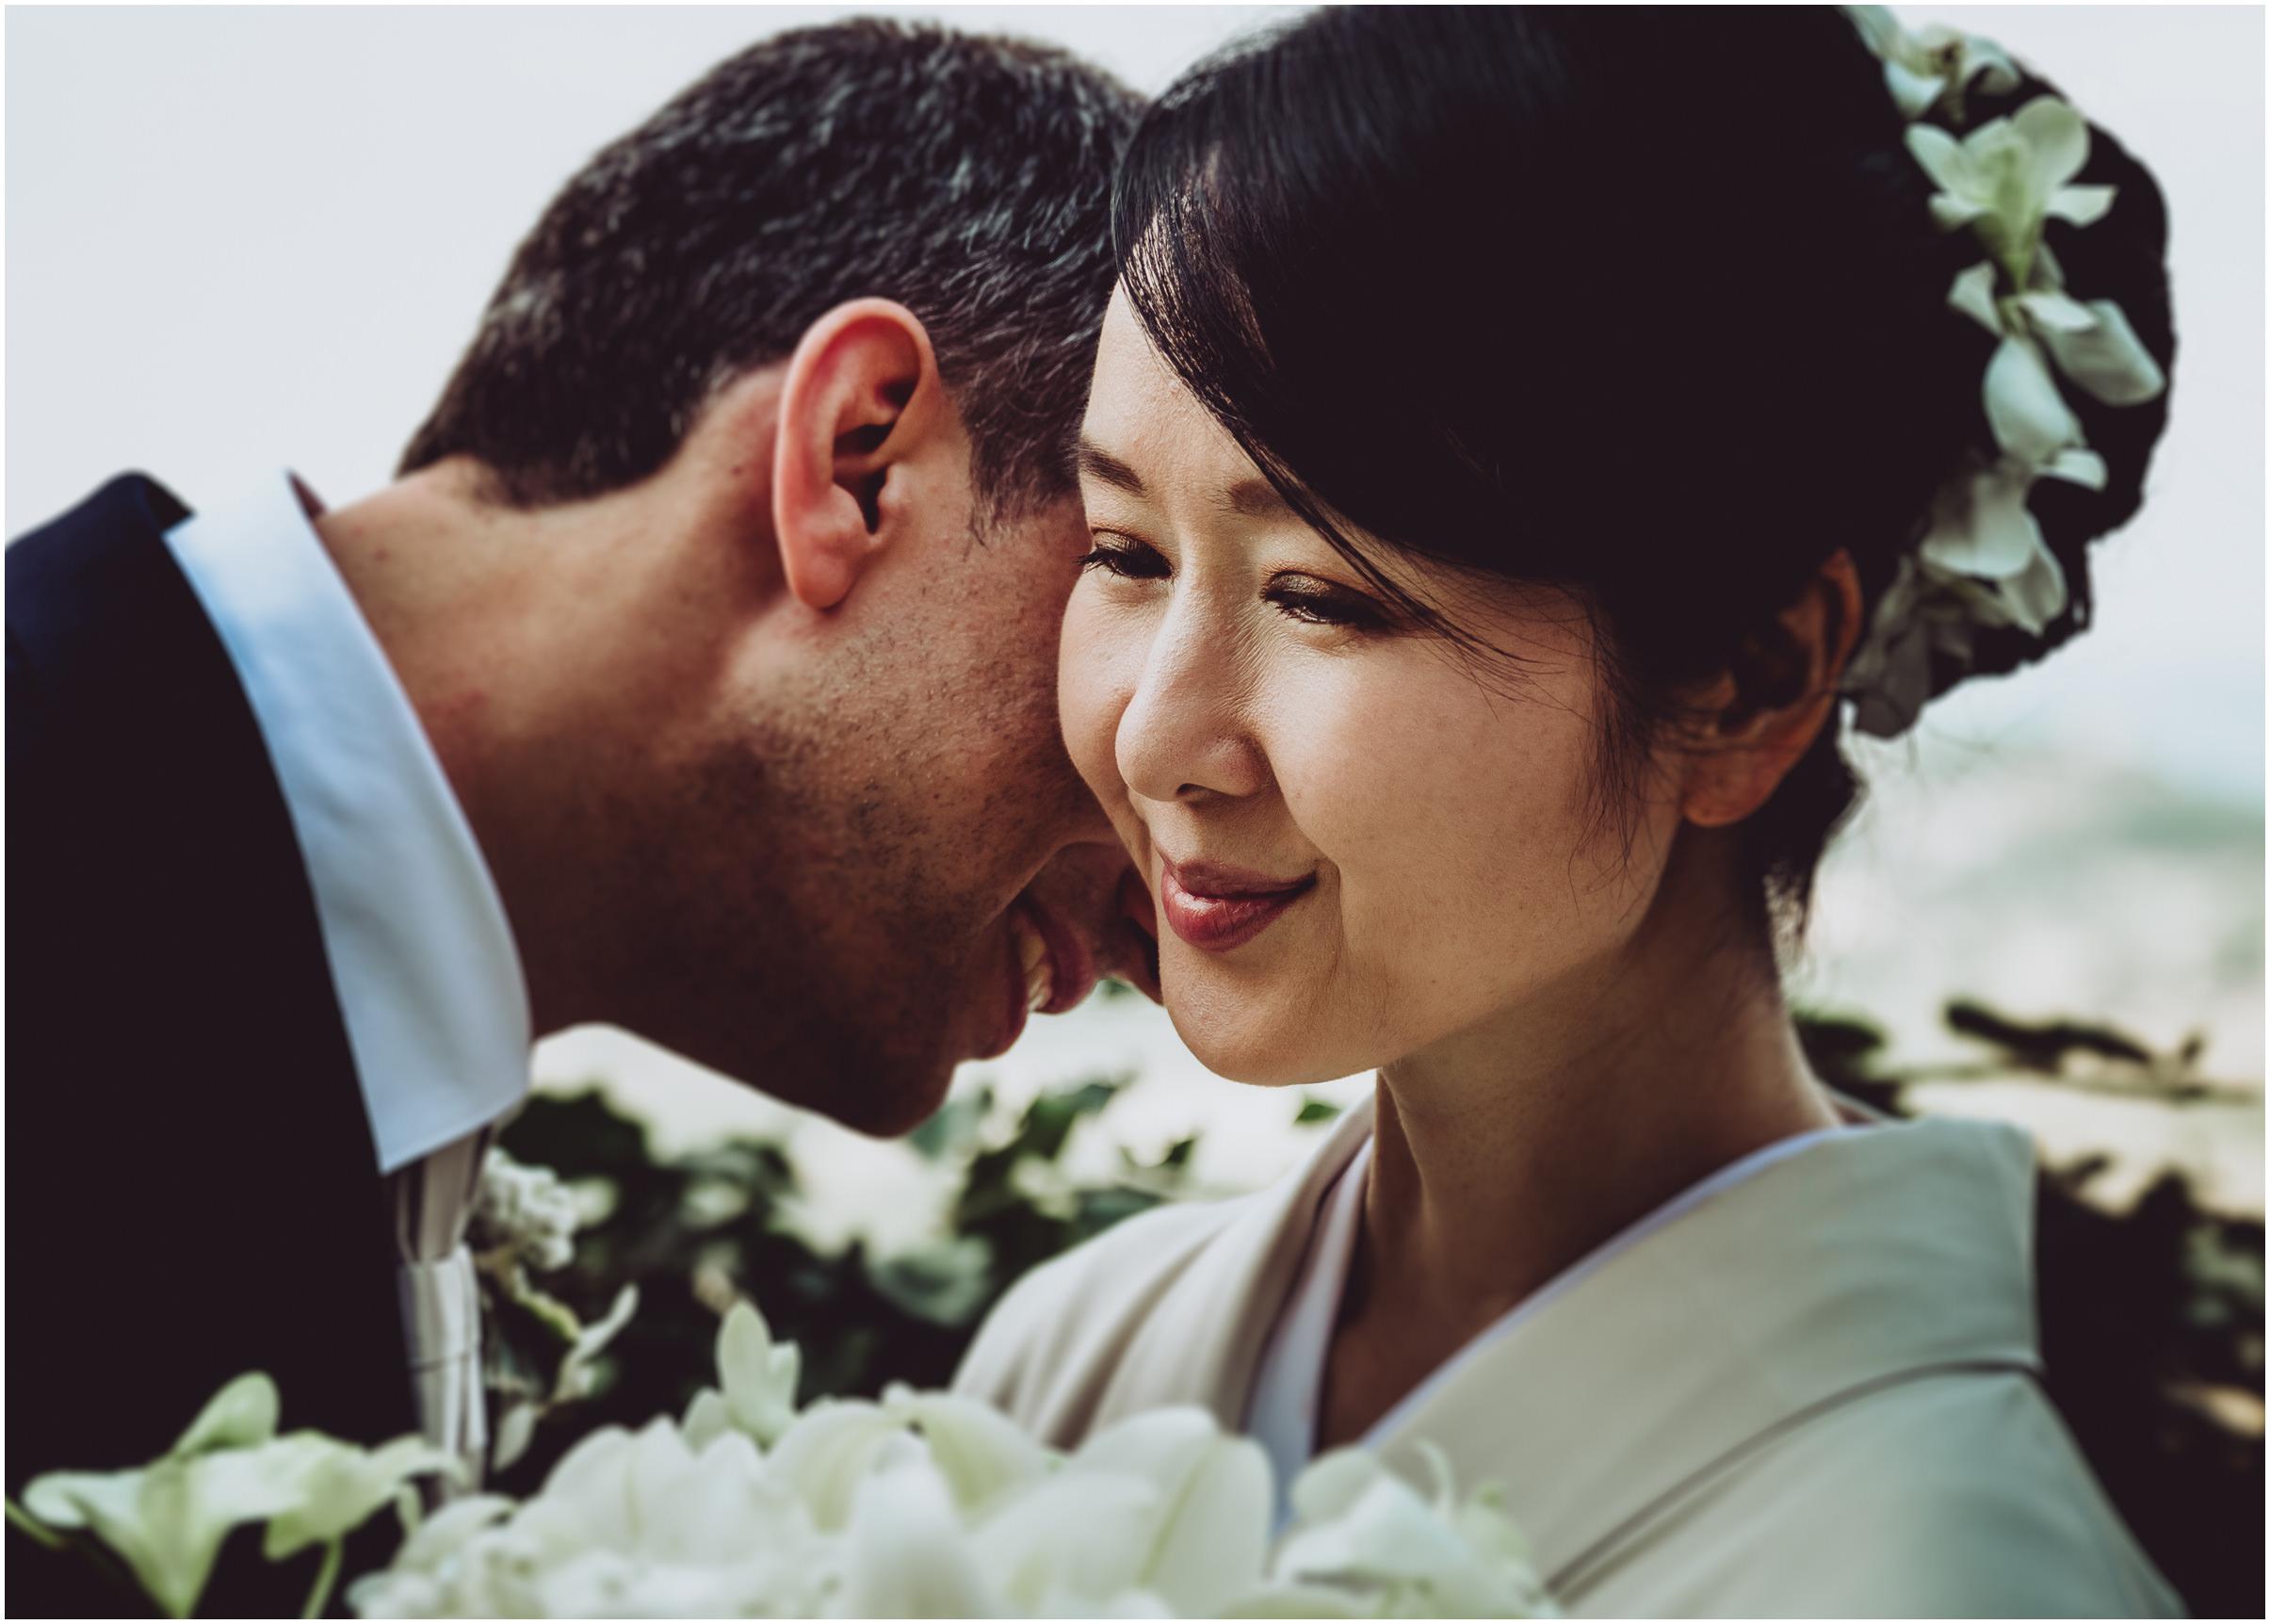 WEDDING-PHOTOGRAPHY-SARA-LORENZONI-FOTOGRAFIA-MATRIMONIO-ORVIETO-JUKA-ANTONELLO33